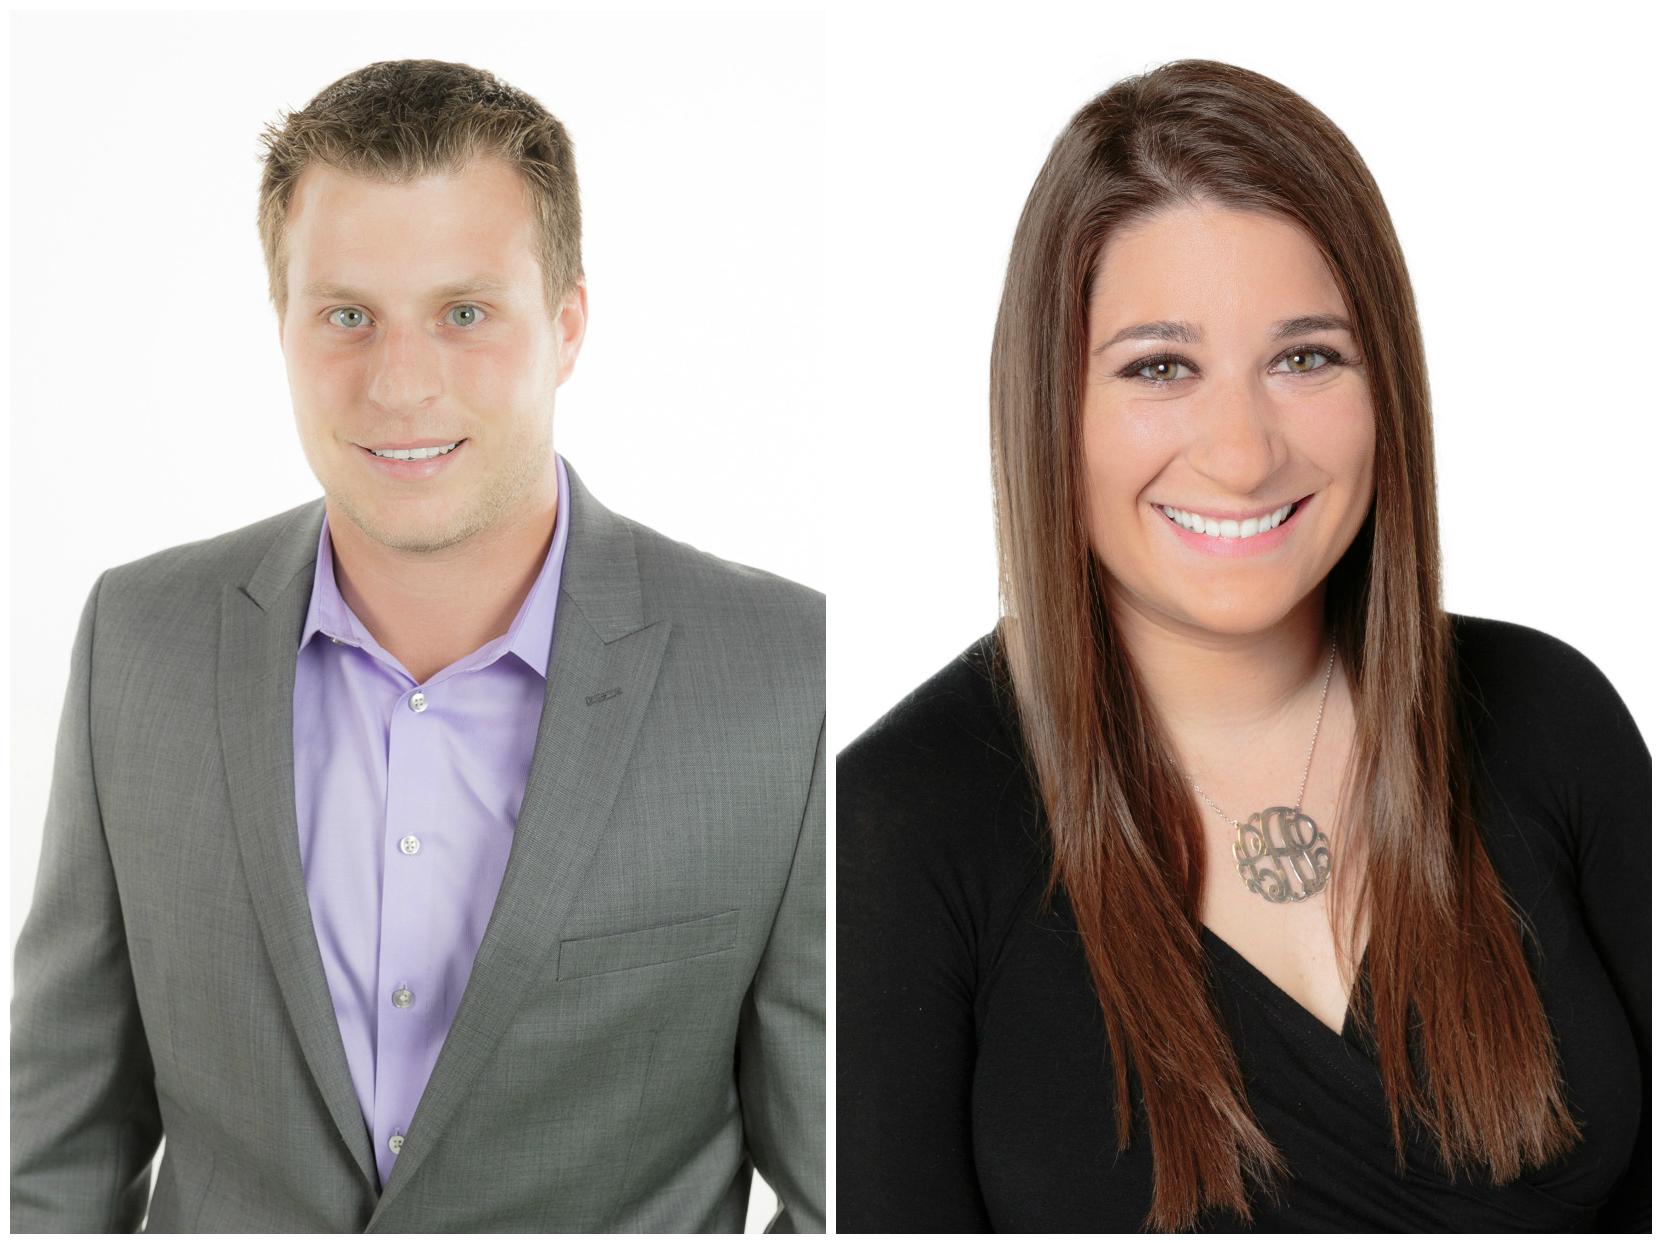 Jimmy Hammel and Lindsay Listanski